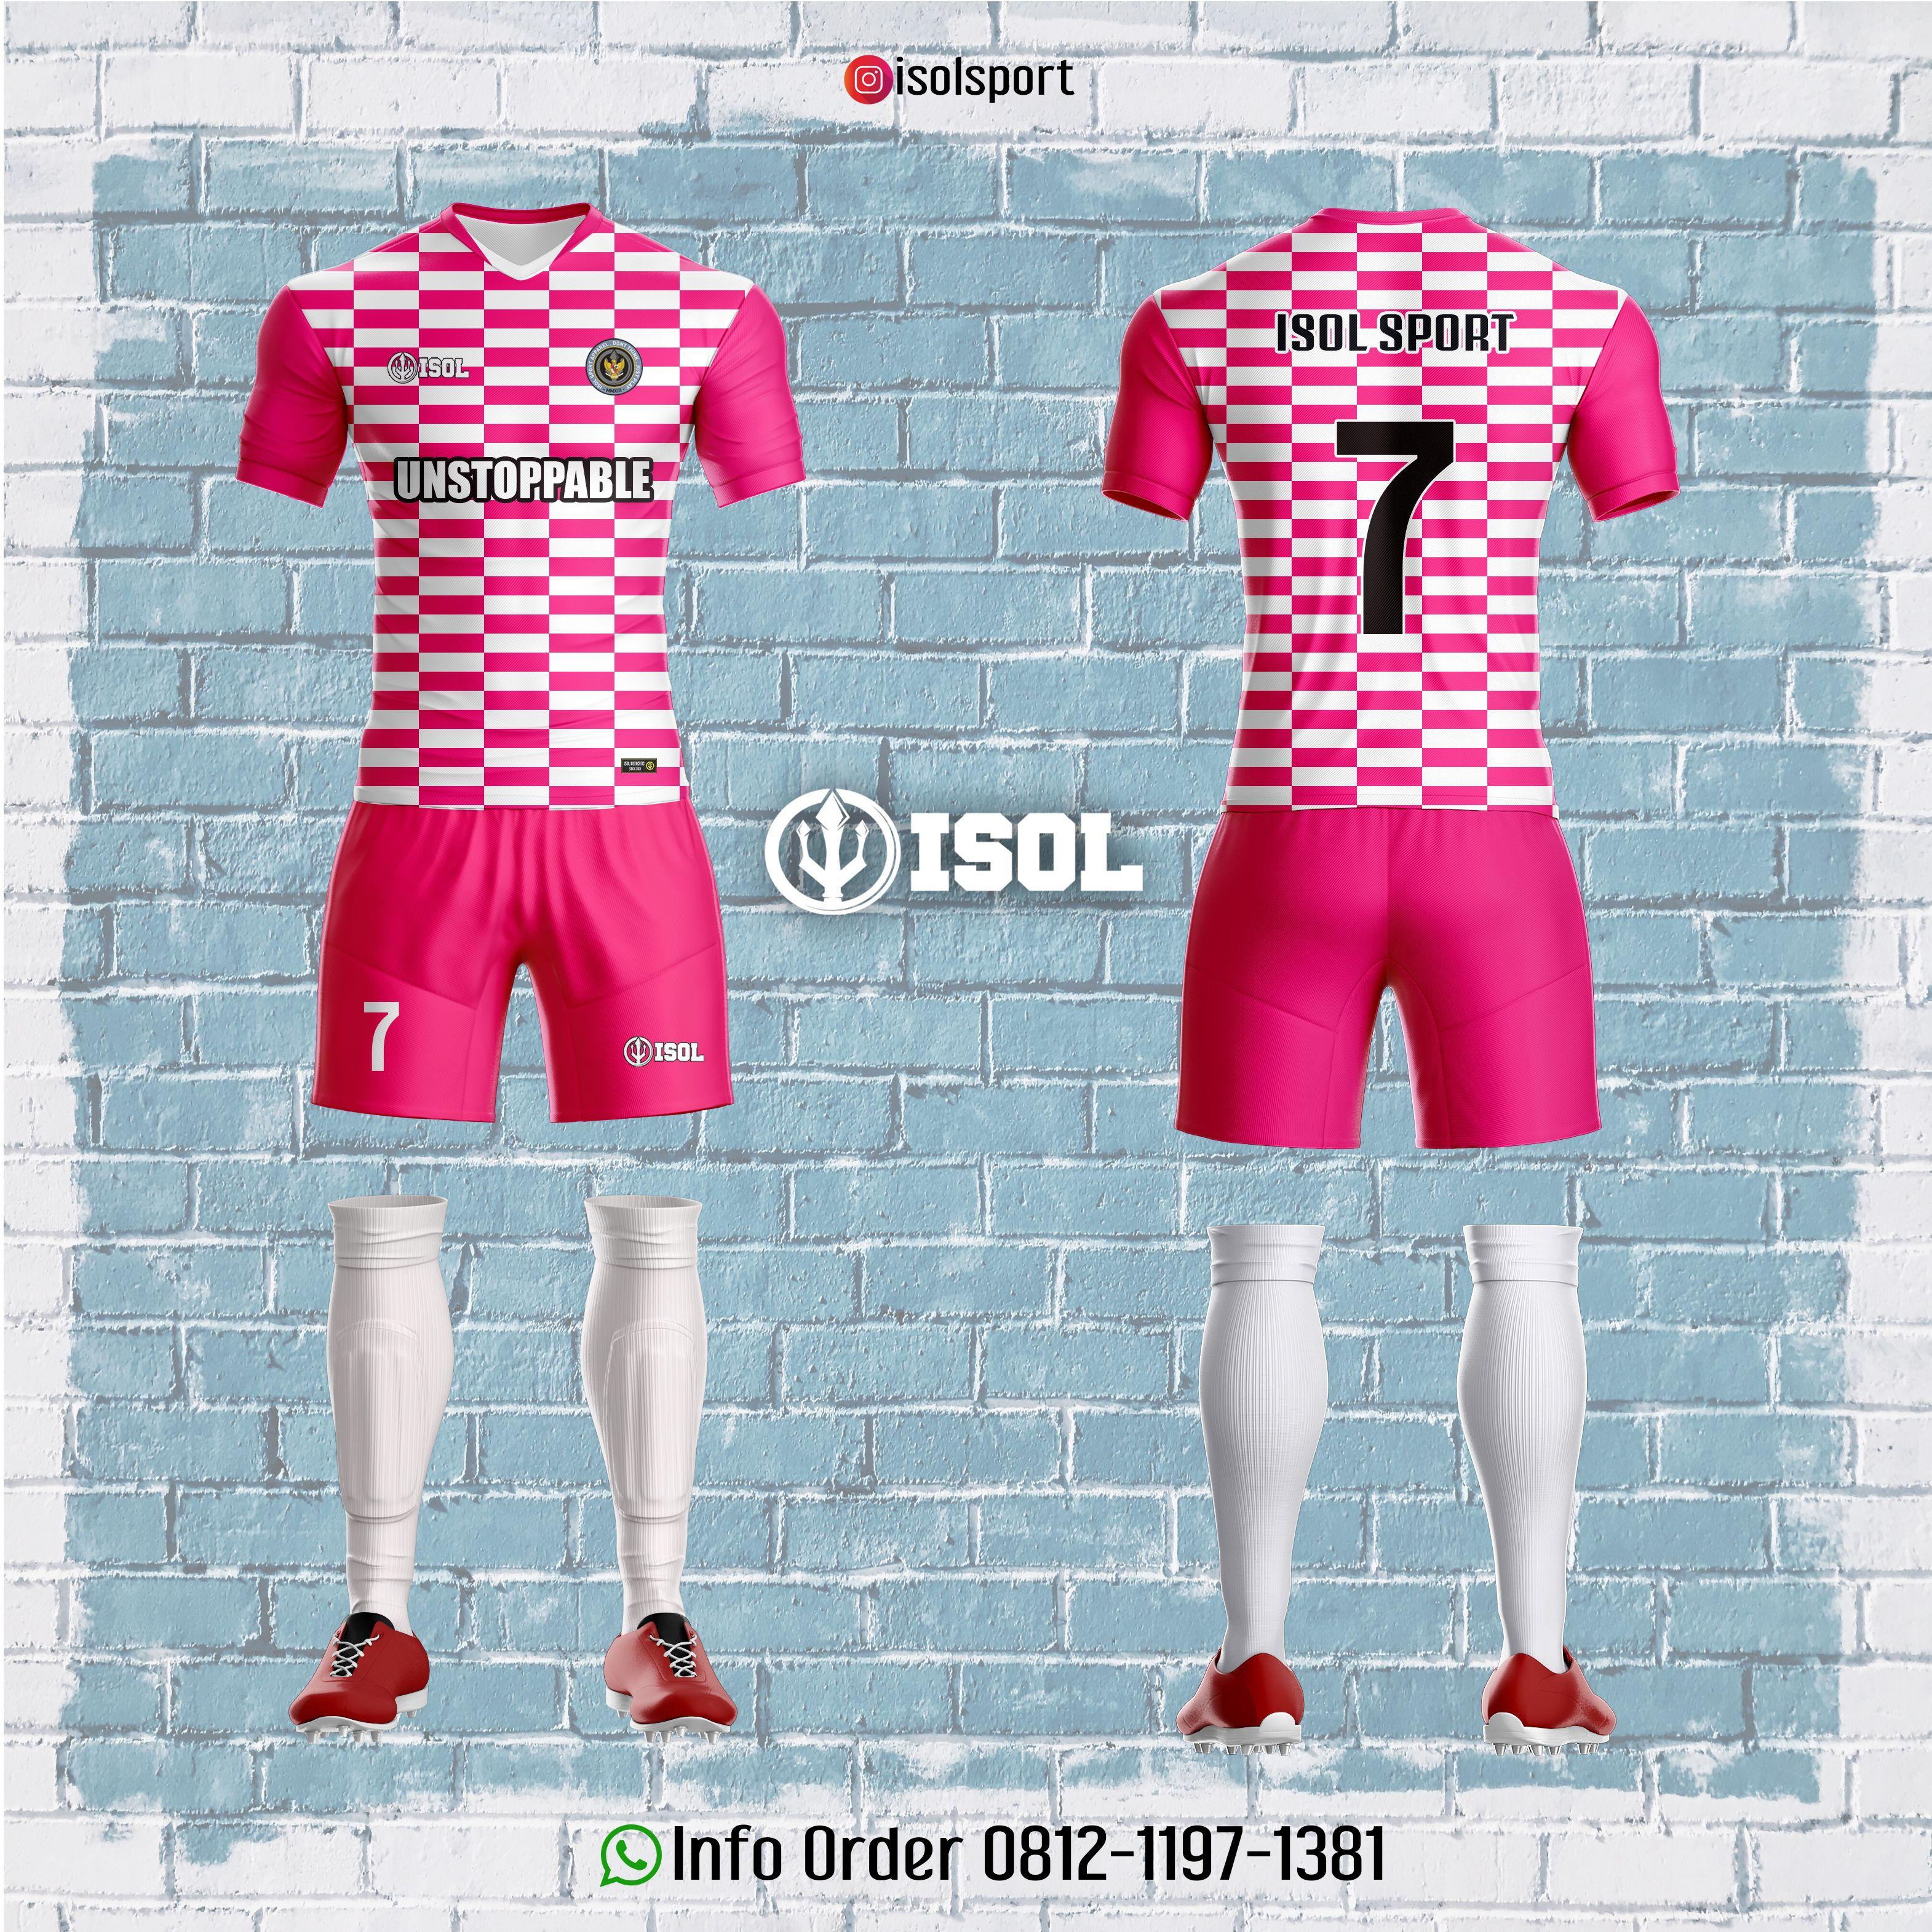 Desain Jersey Keren Warna Pink Isolsport Bikins Fashion Swimwear